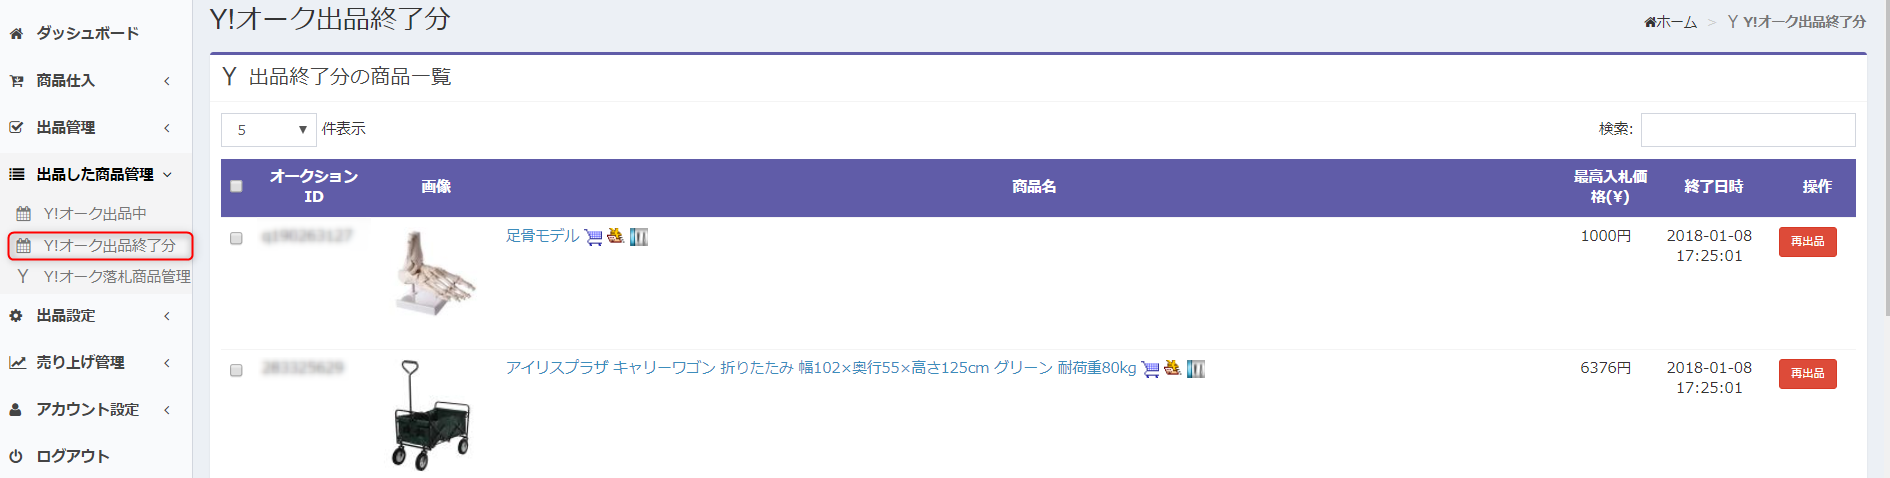 2018 01 09 04h34 28 【TOOL】第三章 ツールの設定